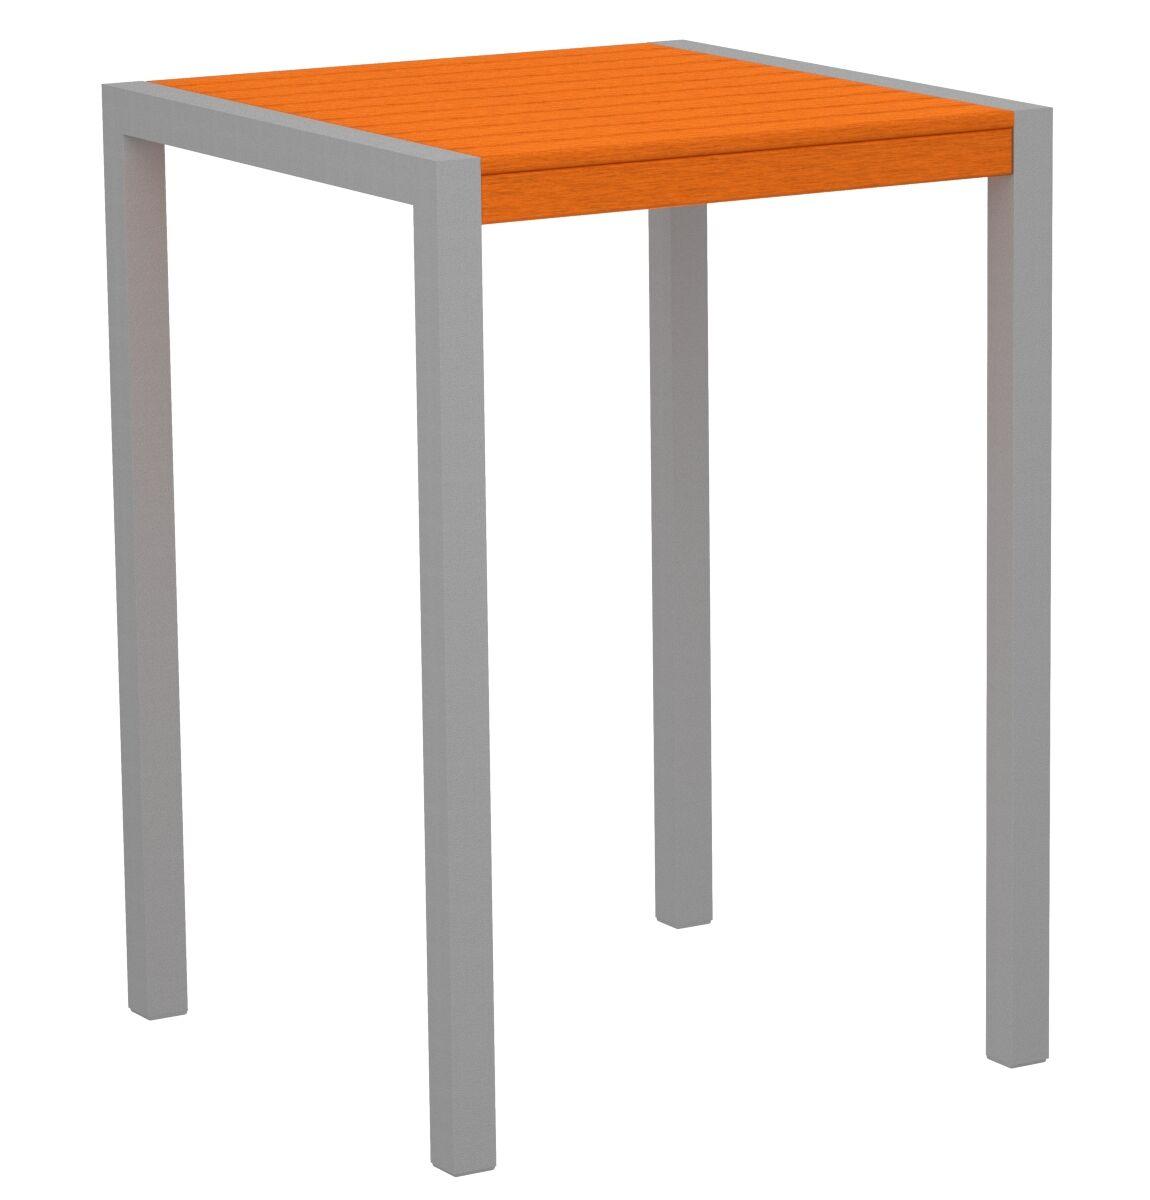 Mod Bar Table Base Finish: Textured Silver, Top Finish: Tangerine